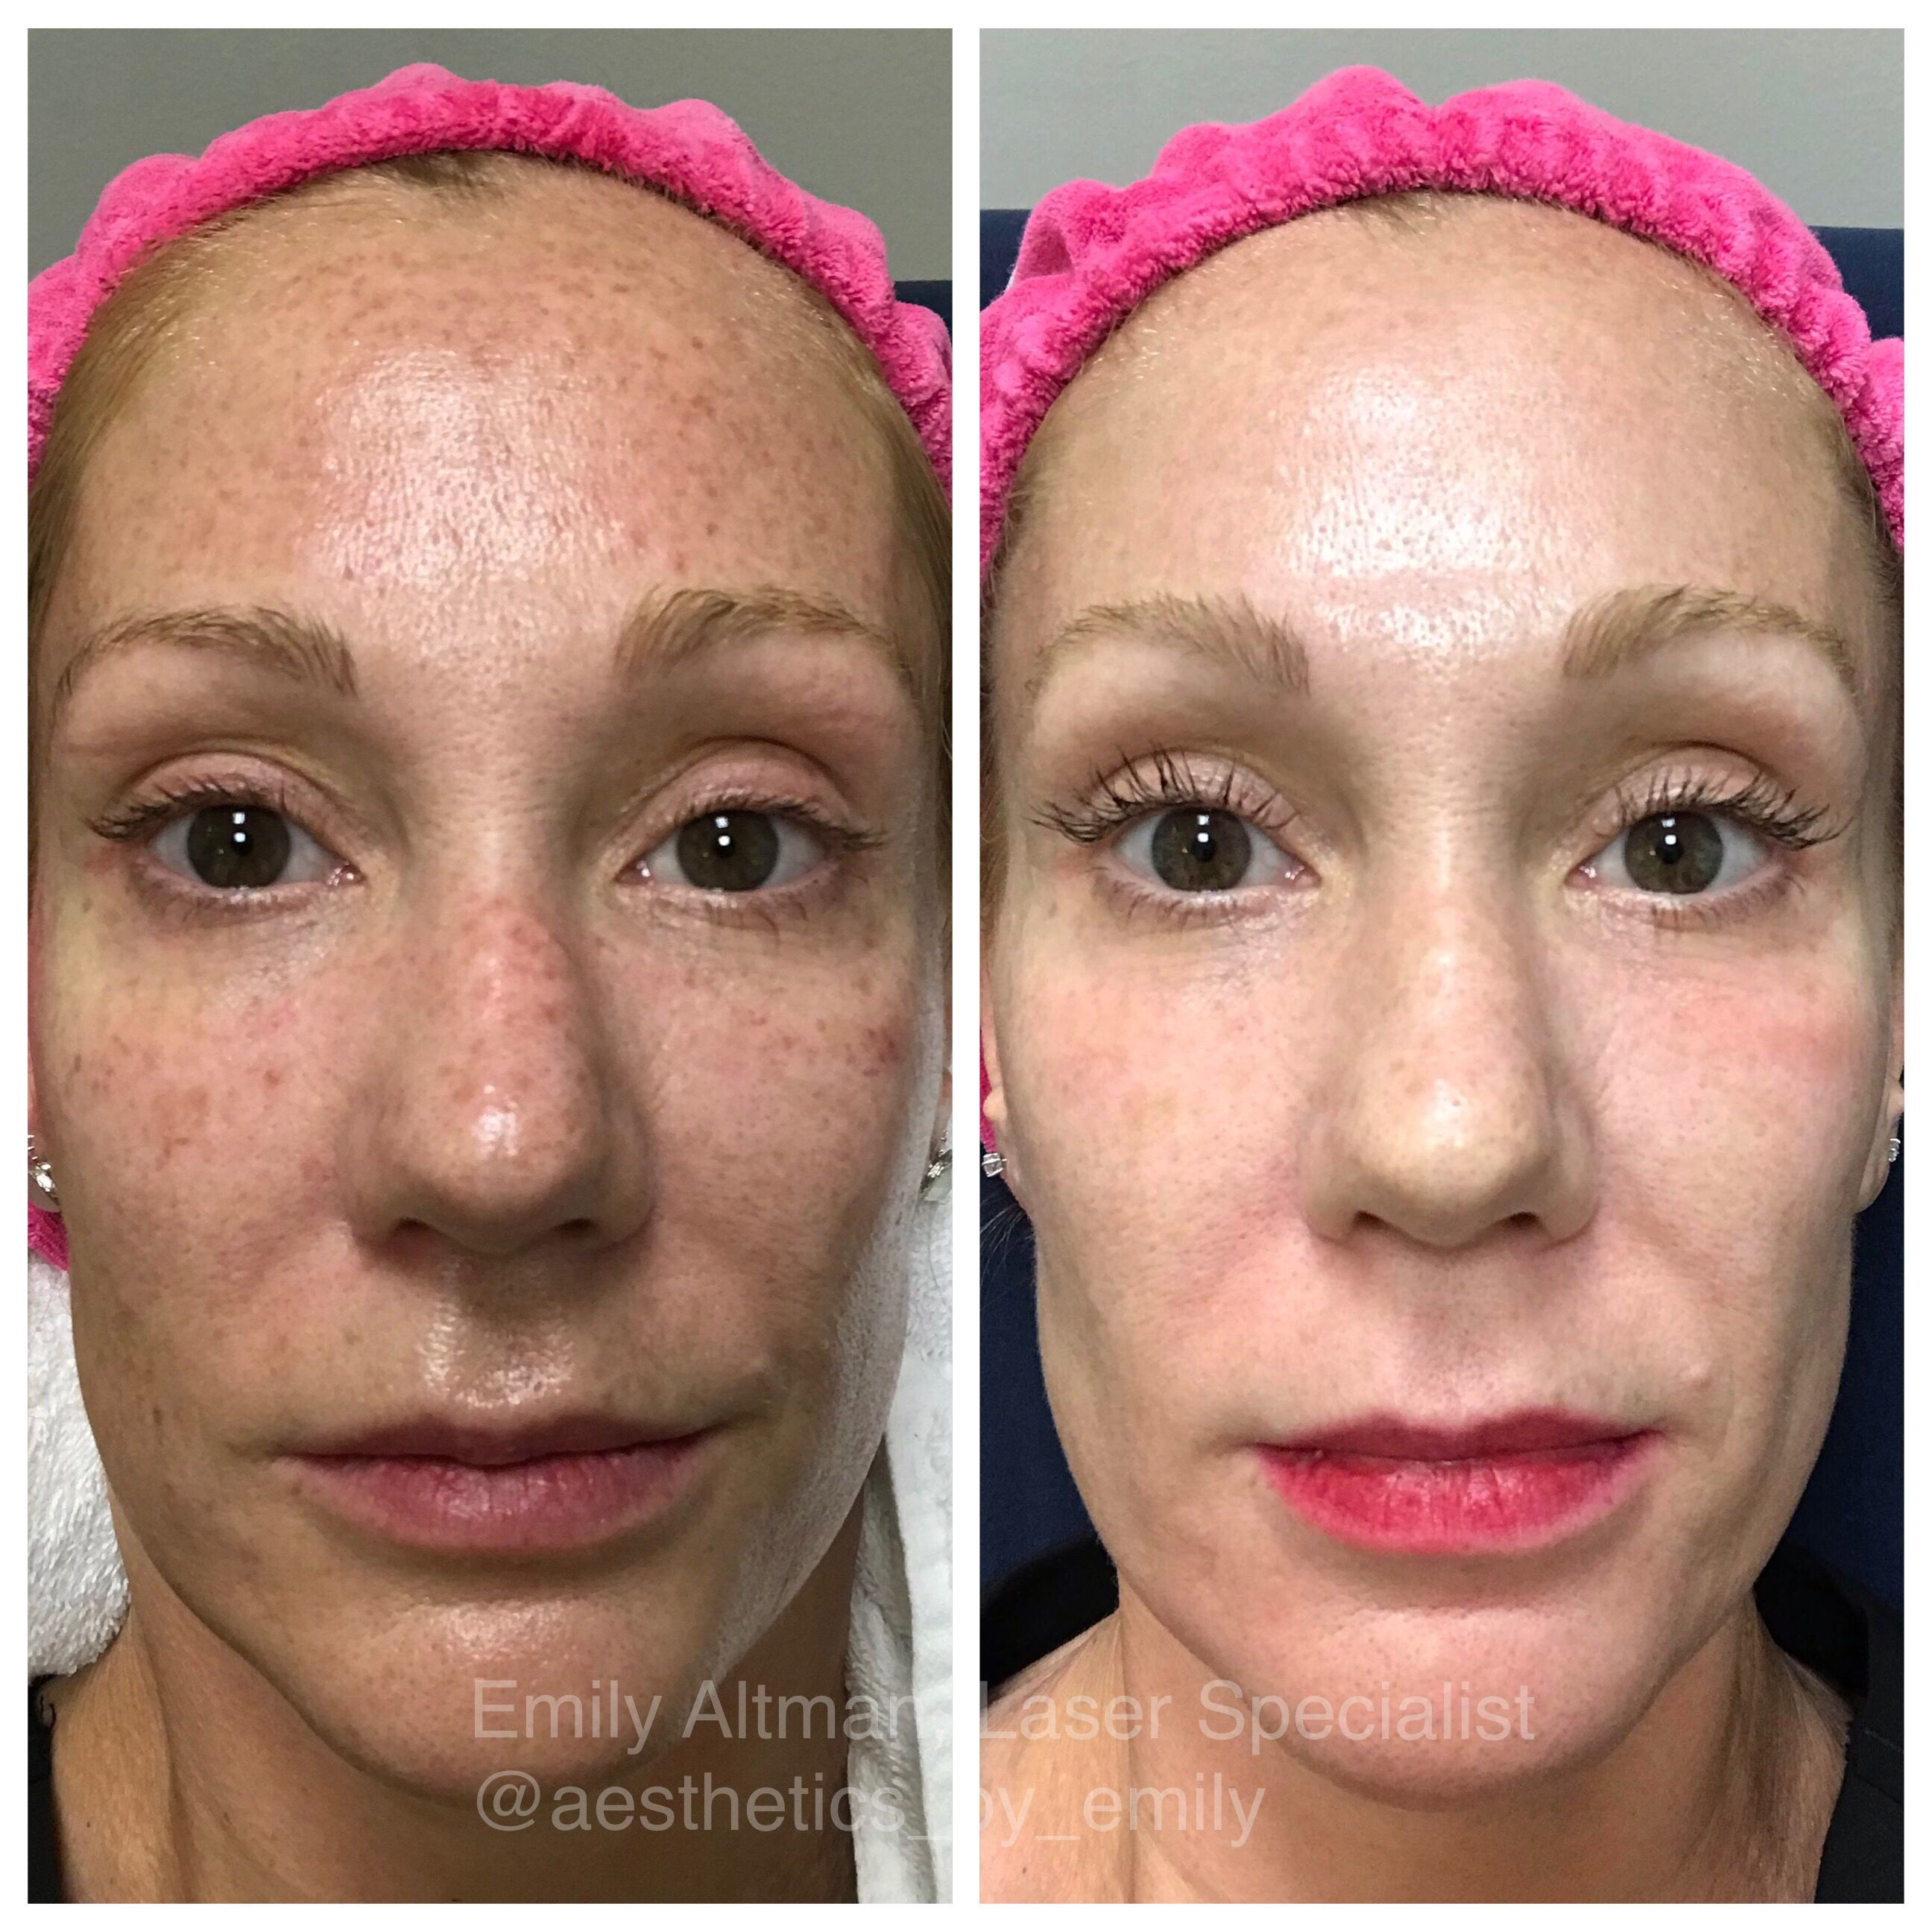 Ipl Before After Laser Skin Ipl Treatment Treat Skin